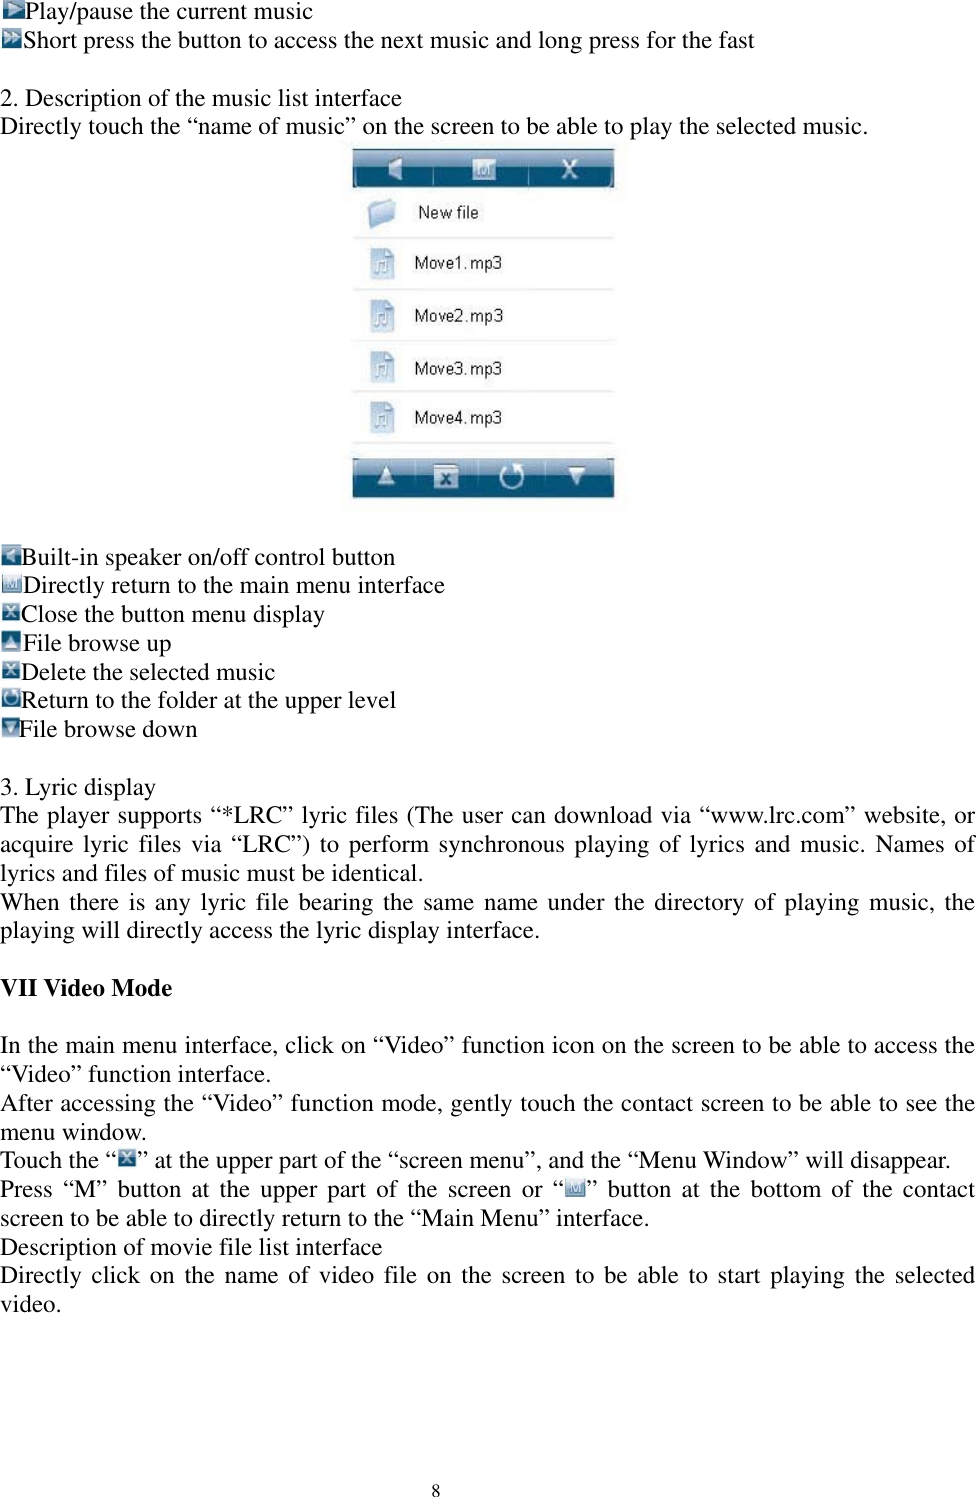 Sylvania Smpk 7834 Users Manual User Of SMPK8854B